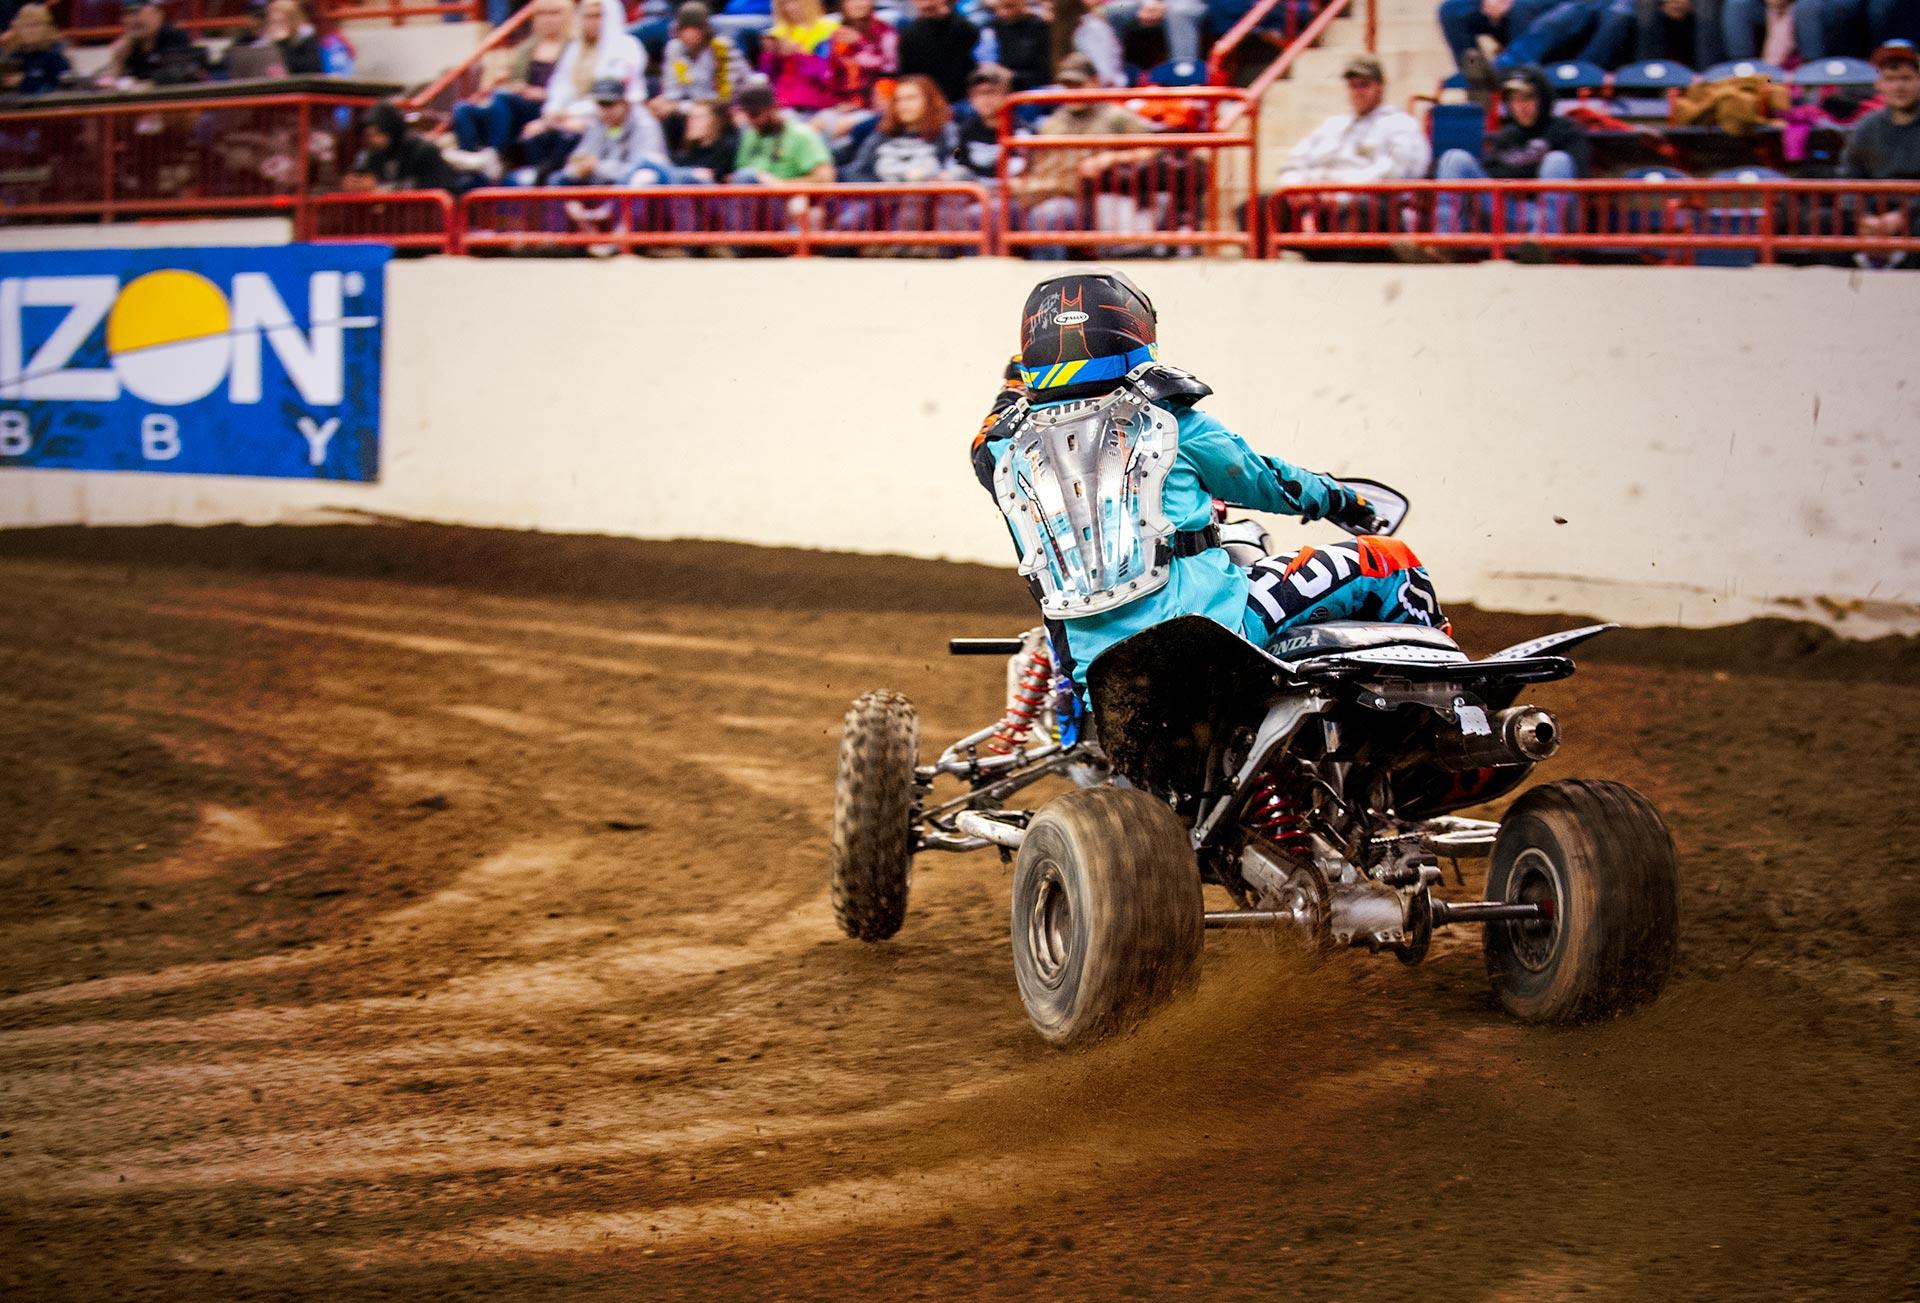 A quad slides into the turn at Motorama 2018. Main Arena Pennsylvania Farm Show Complex, Harrisburg, PA